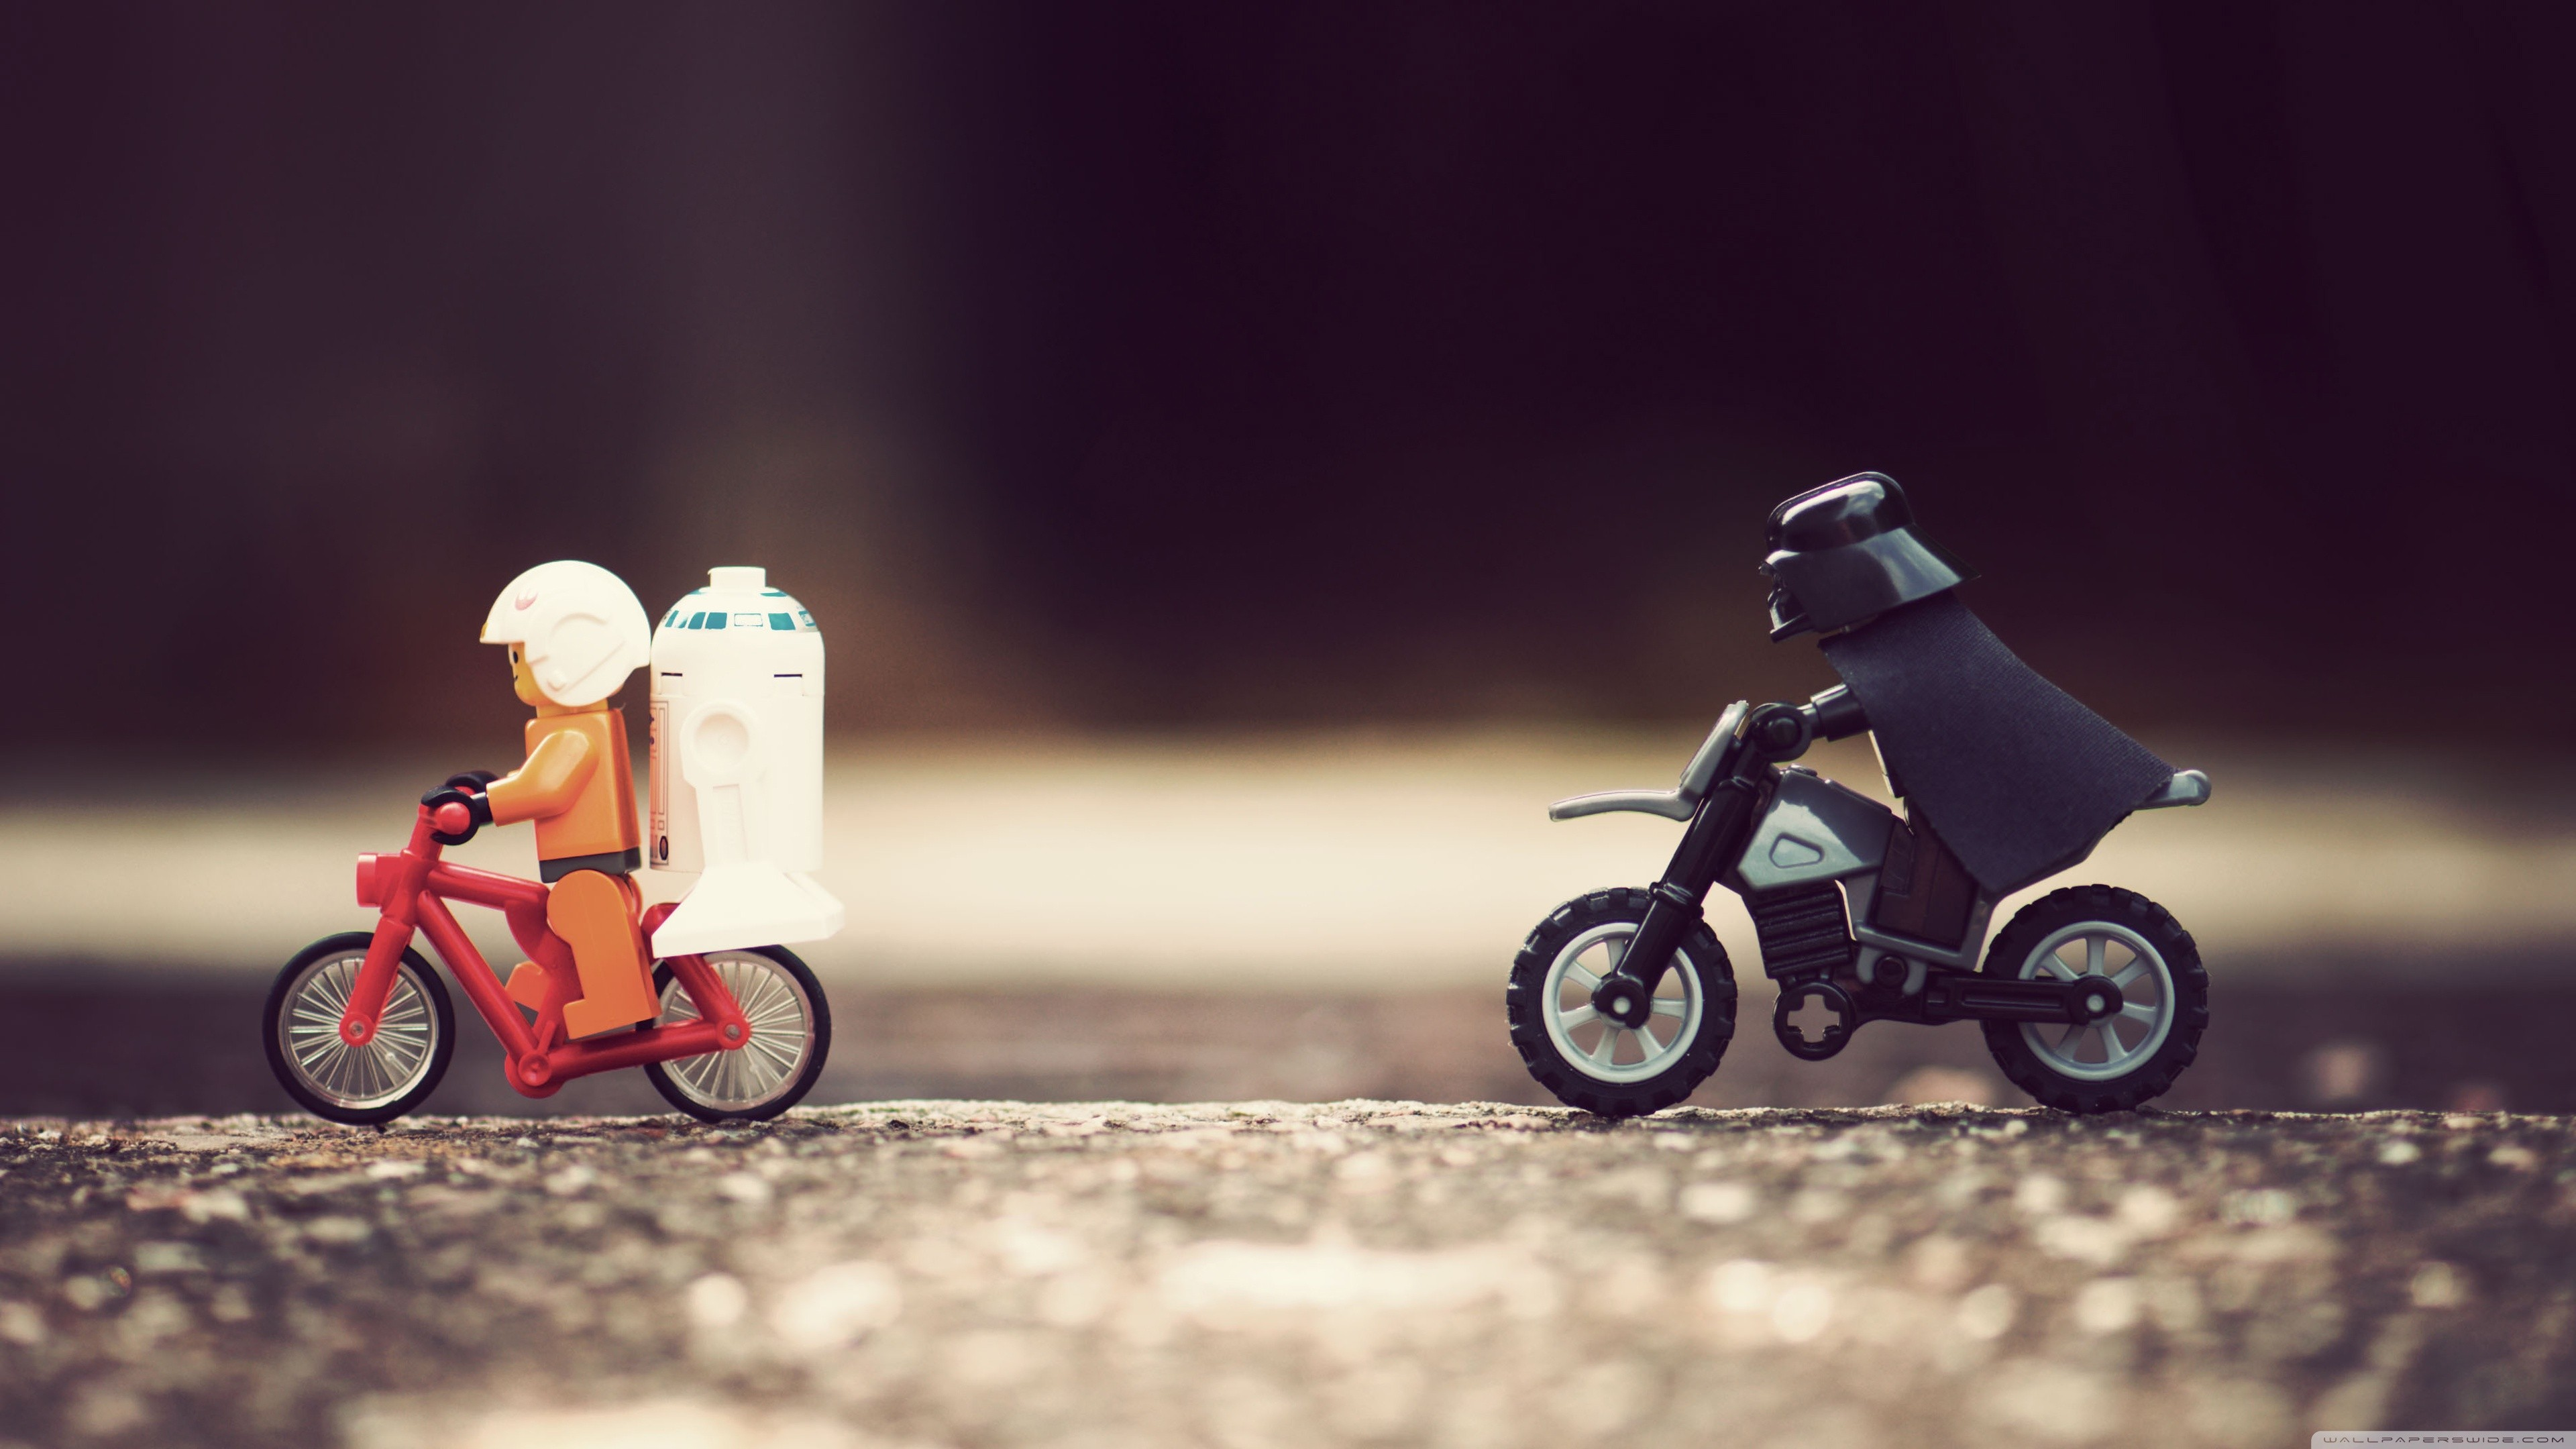 Funny Star Wars Backgrounds Star Wars Bike Funny Legos